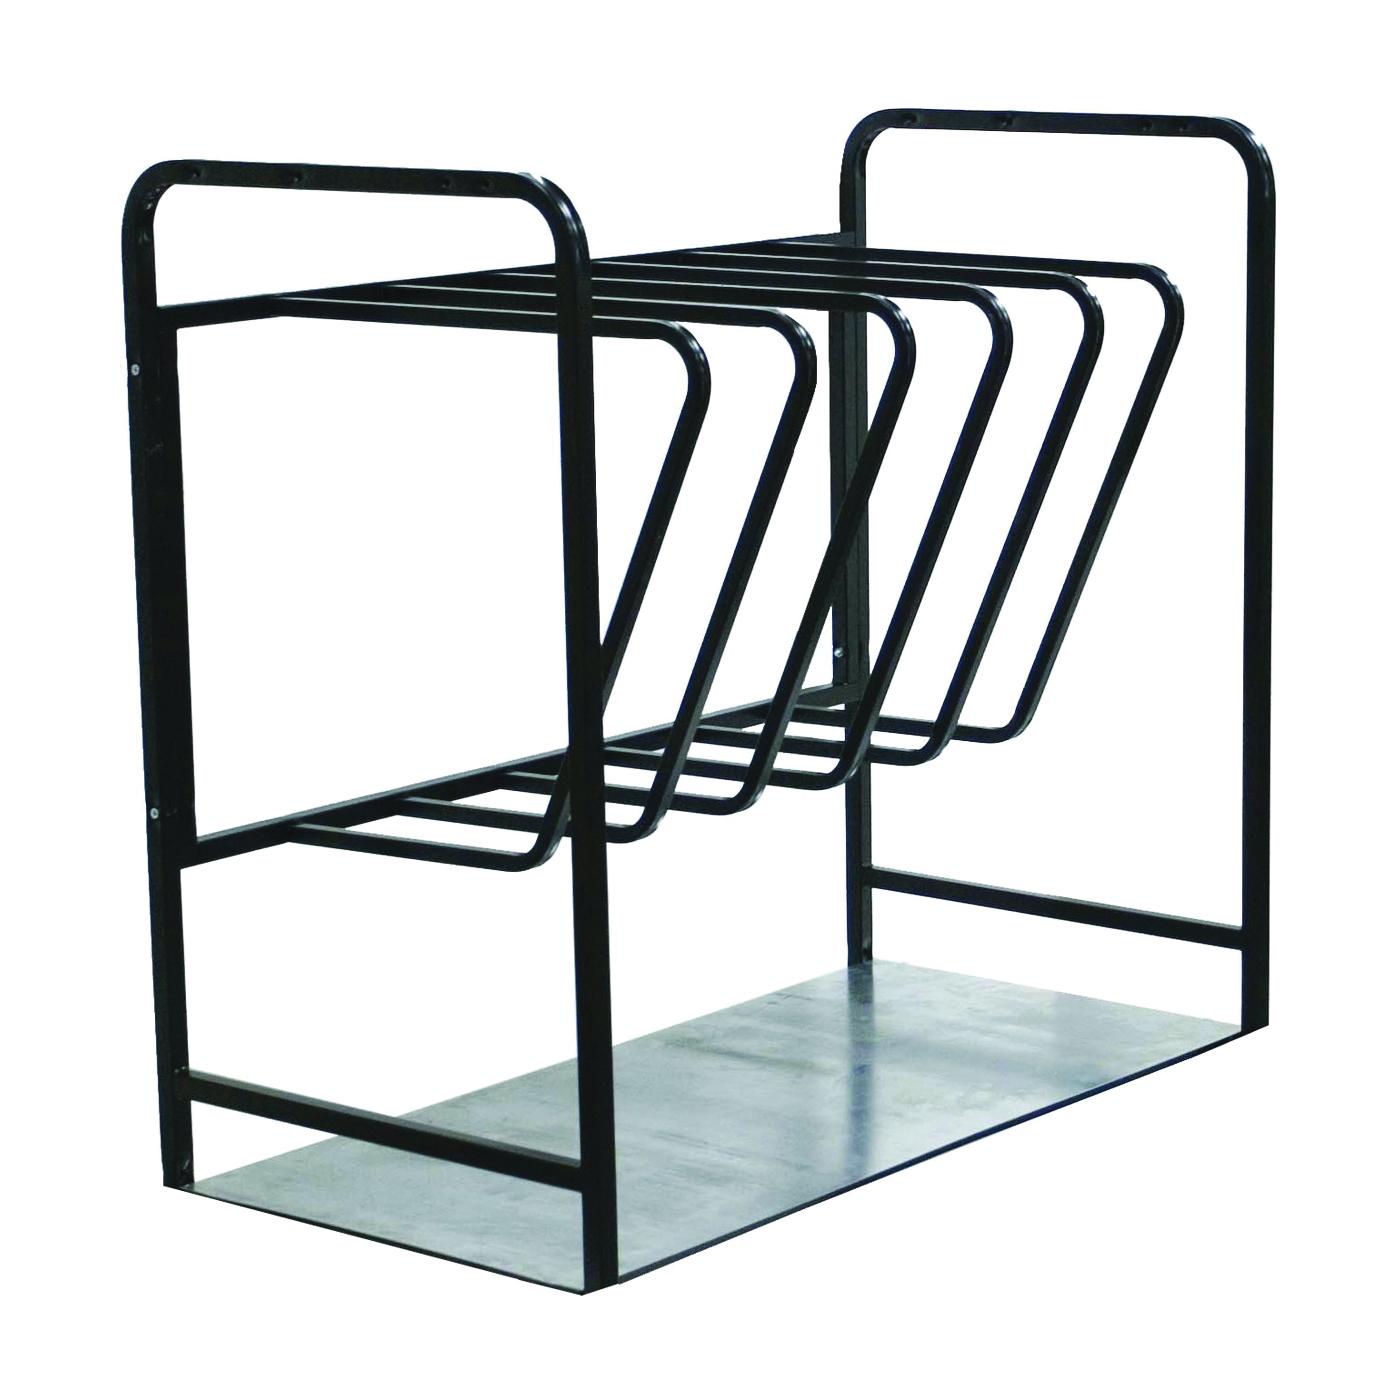 Picture of WERNER 37 Ladder Rack, 7 Ladders, Metal, Black